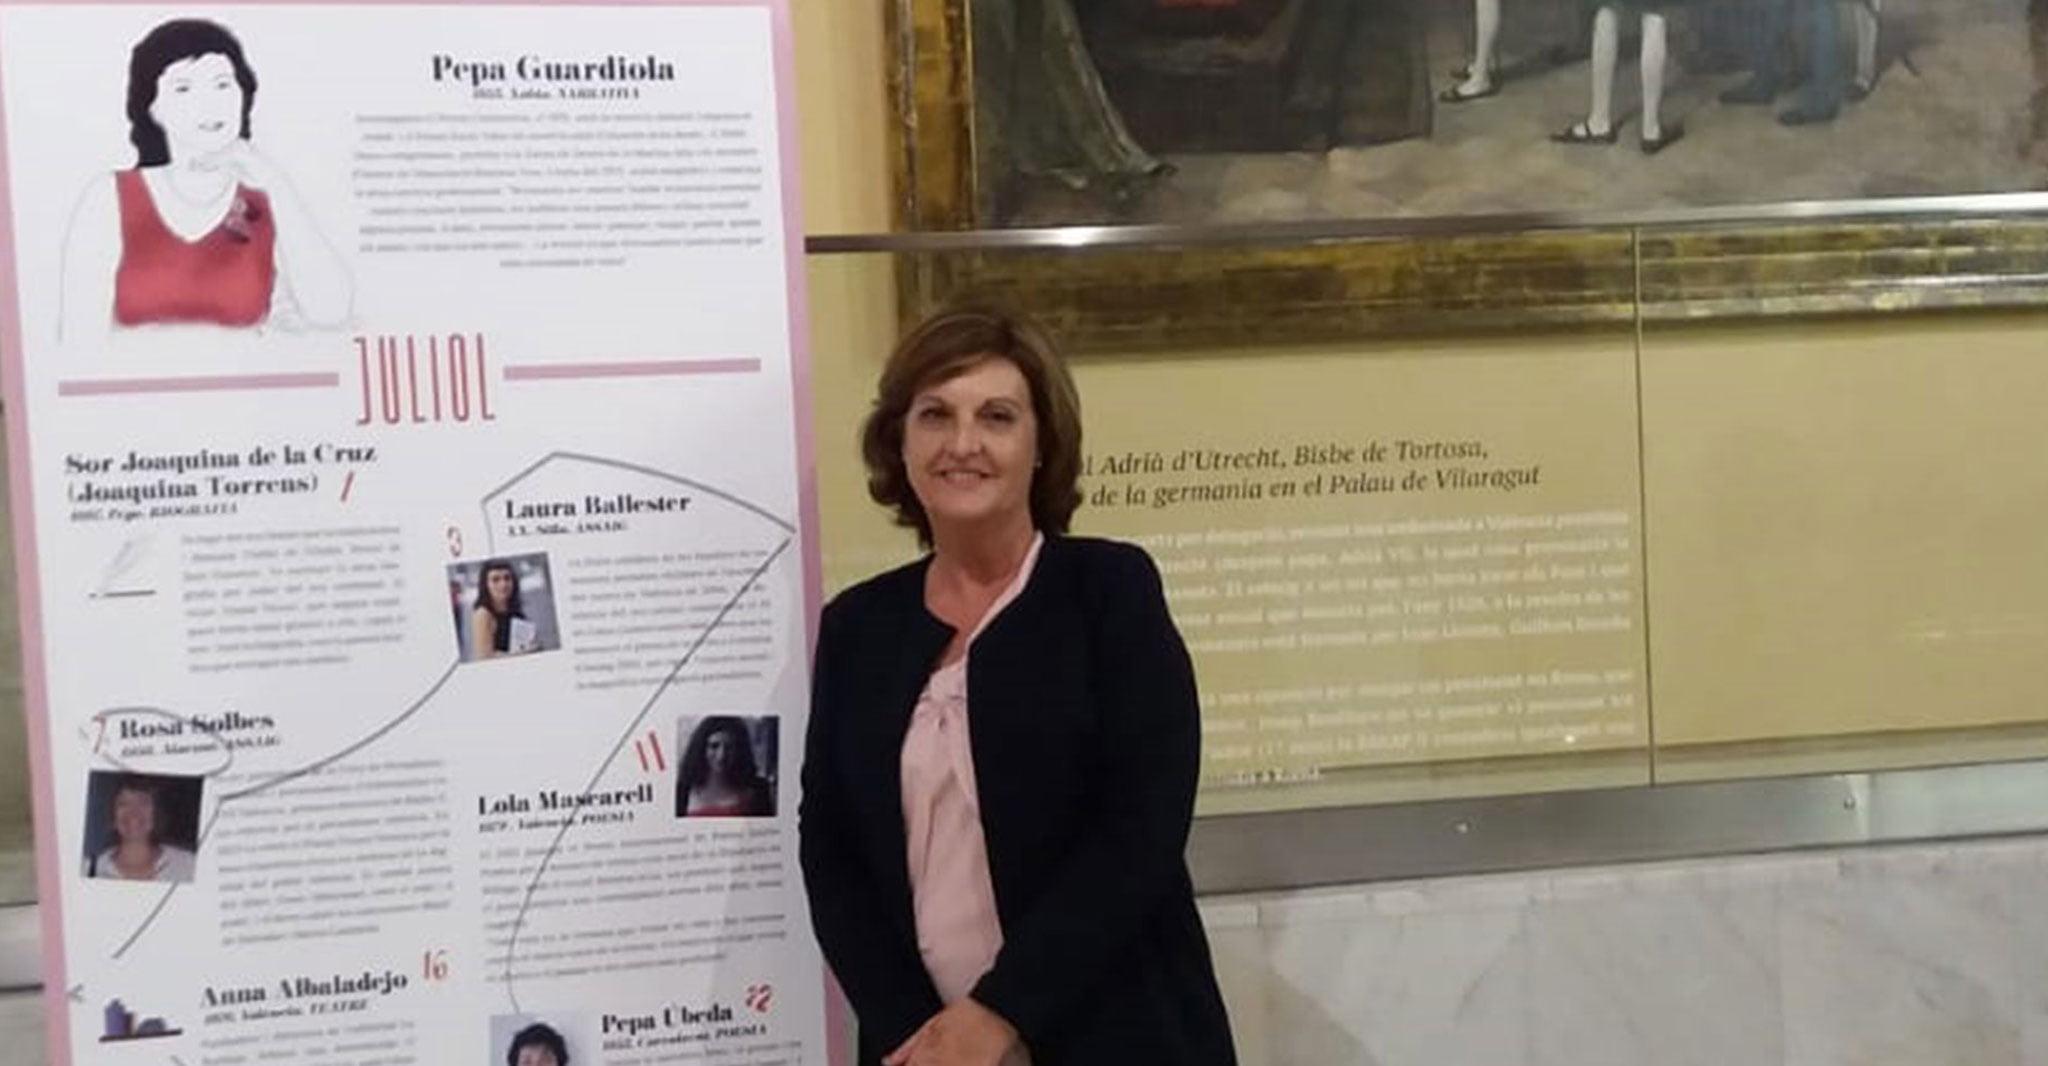 La conocida autora de Xàbia Pepa Guardiola